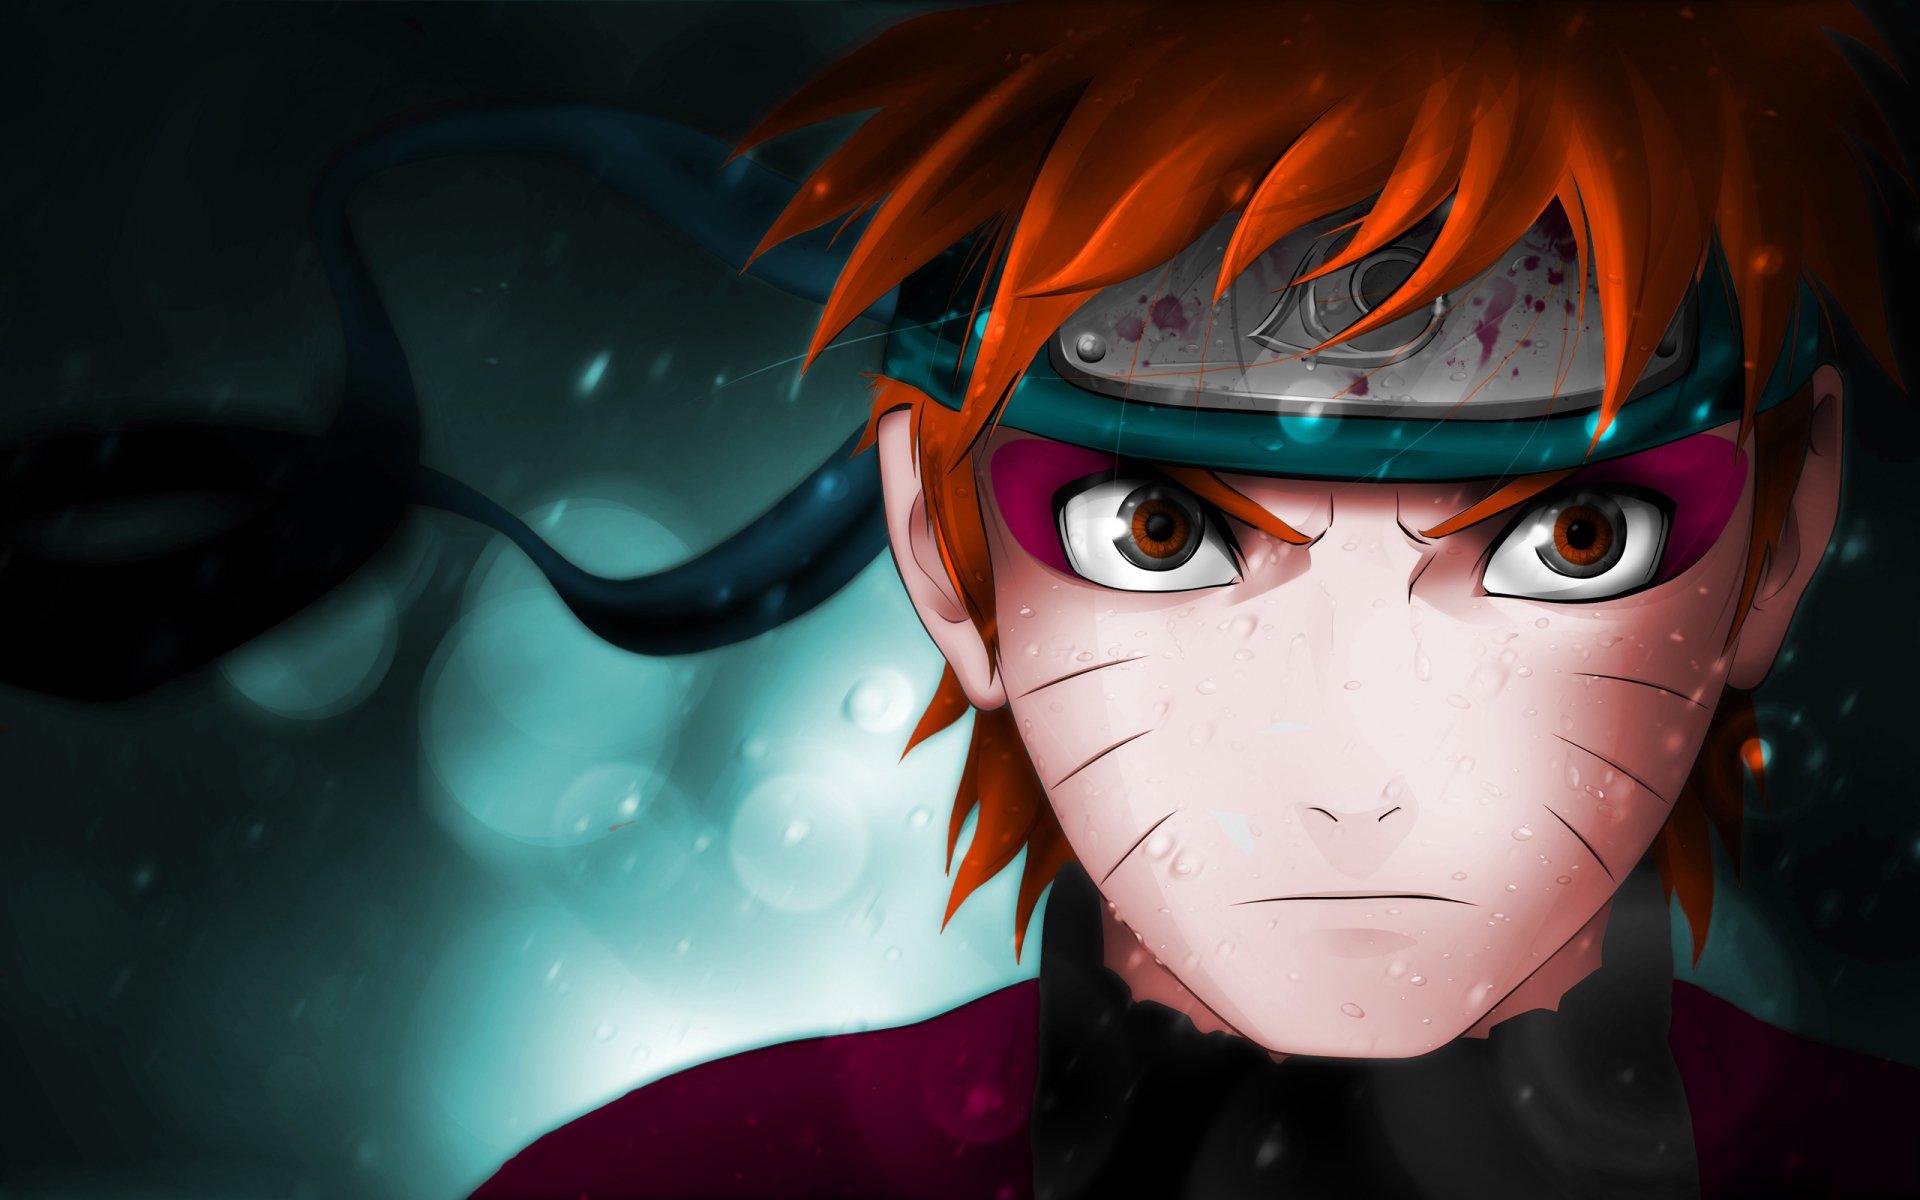 Naruto Fond d'écran HD | Arrière-Plan | 2560x1600 | ID:388251 - Wallpaper Abyss